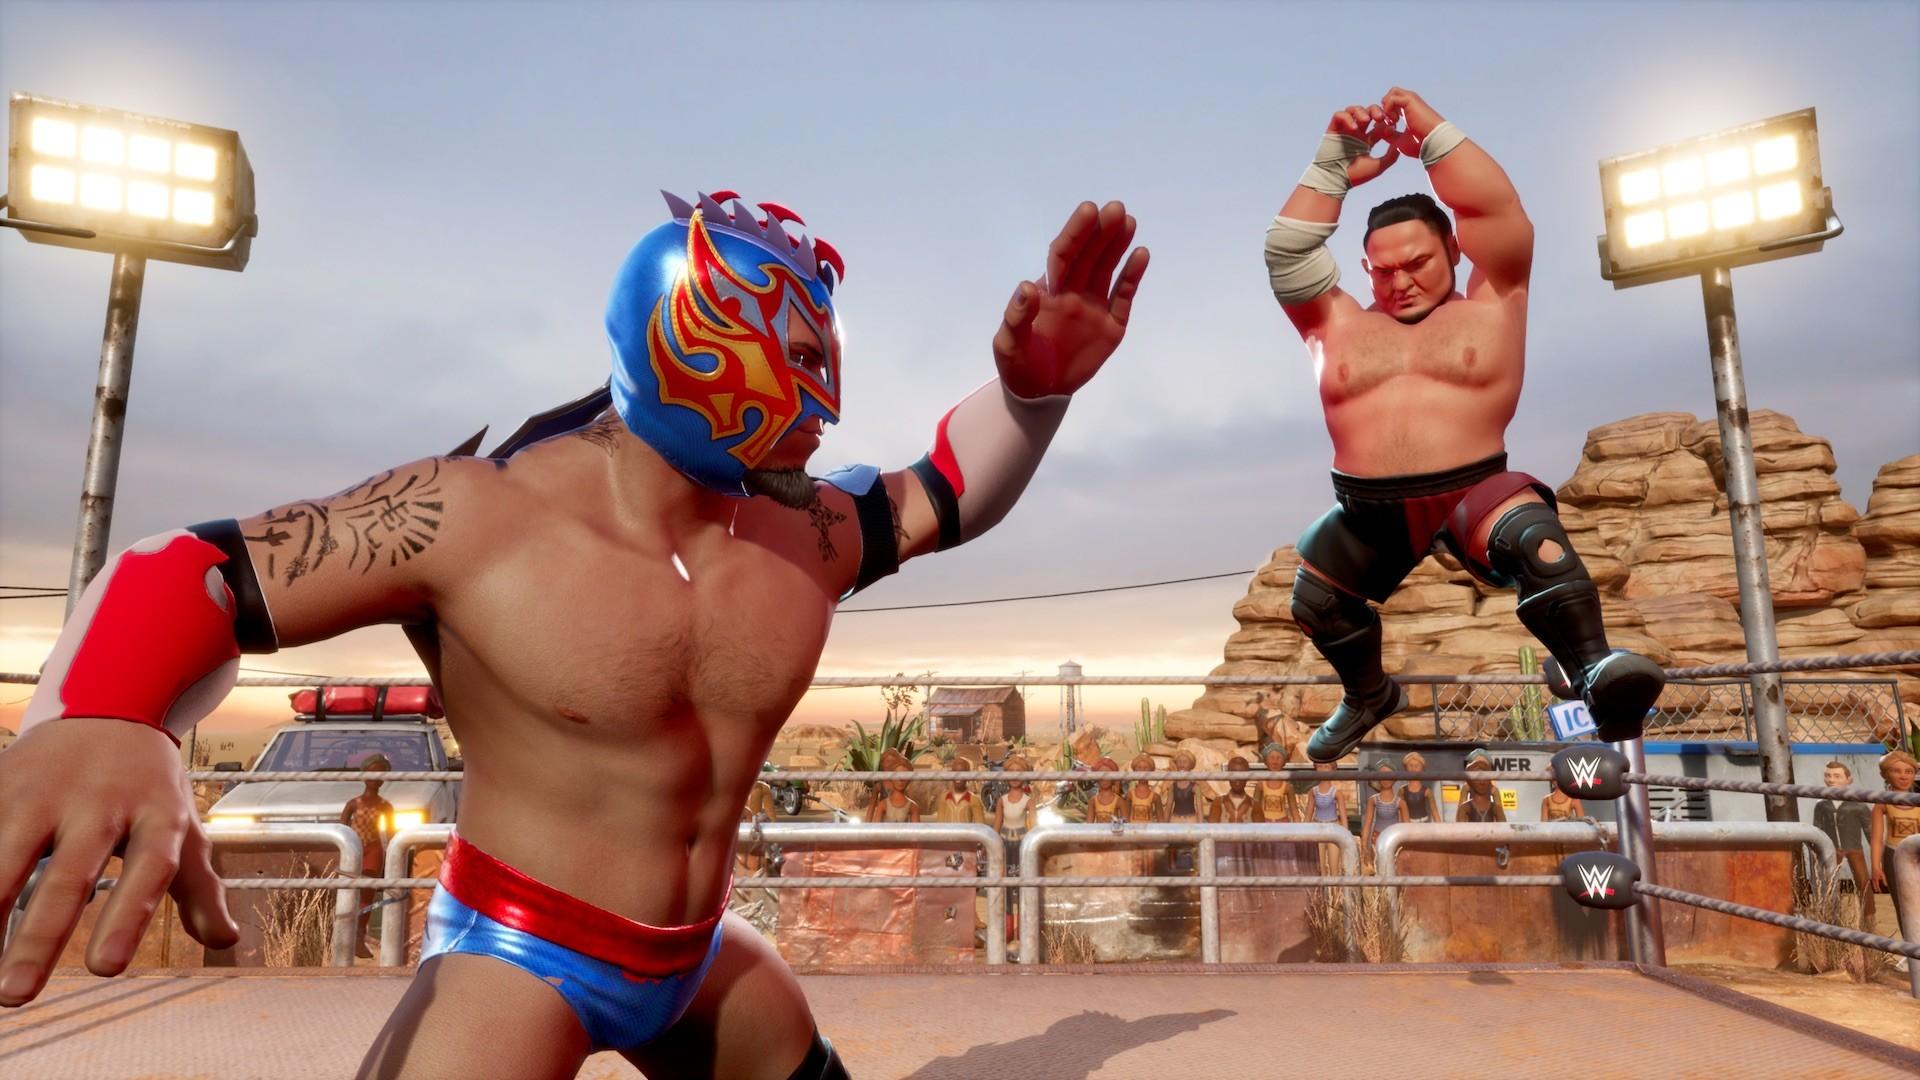 《WWE 2K竞技场》Steam国区139元 目前褒贬不一